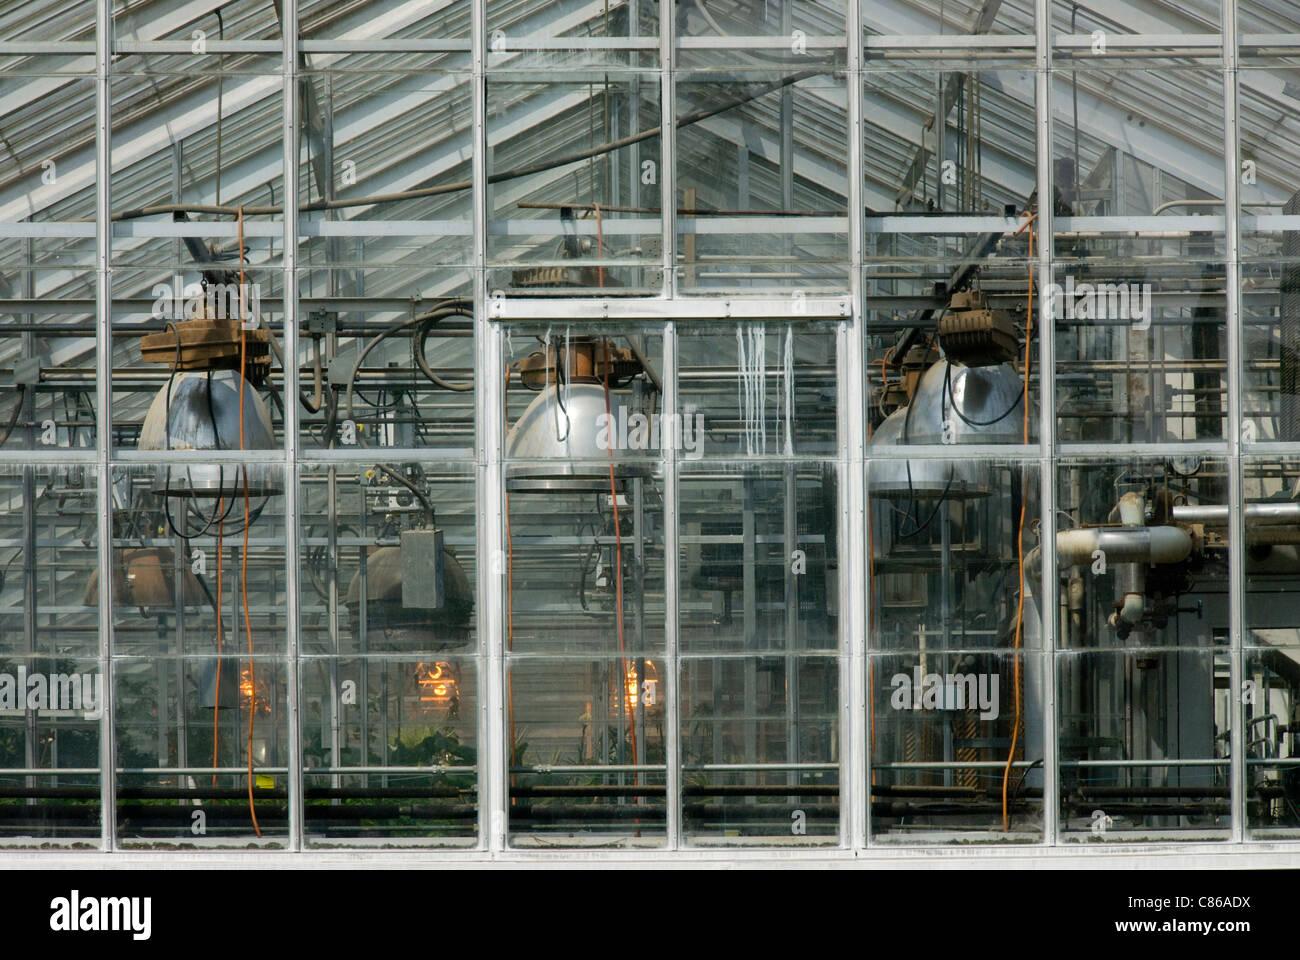 Experimentelle Glashaus, University of Illinois, Urbana, Illinois, USA Stockbild